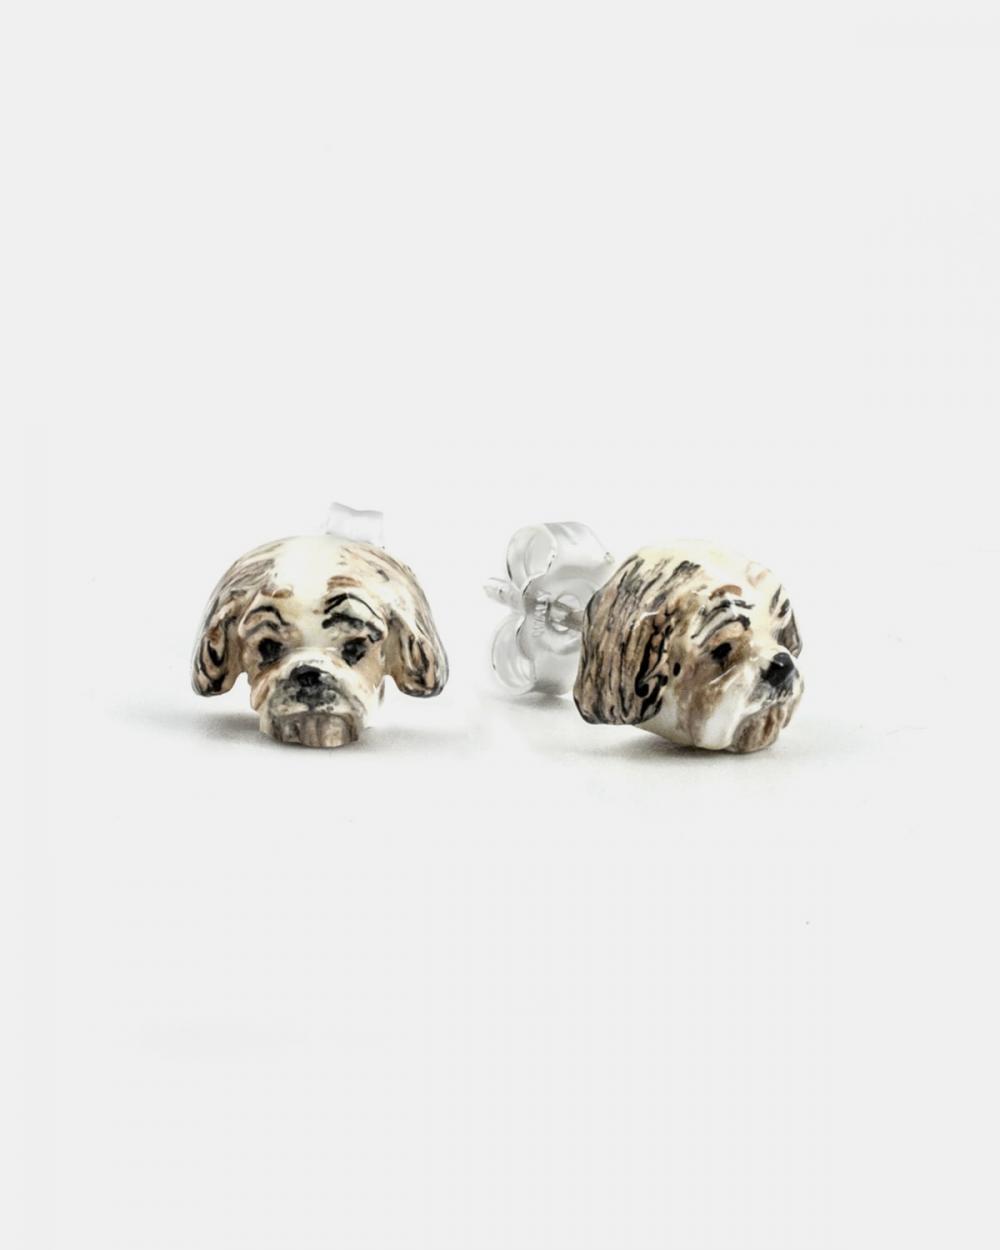 shitzu couple earrings enamelled